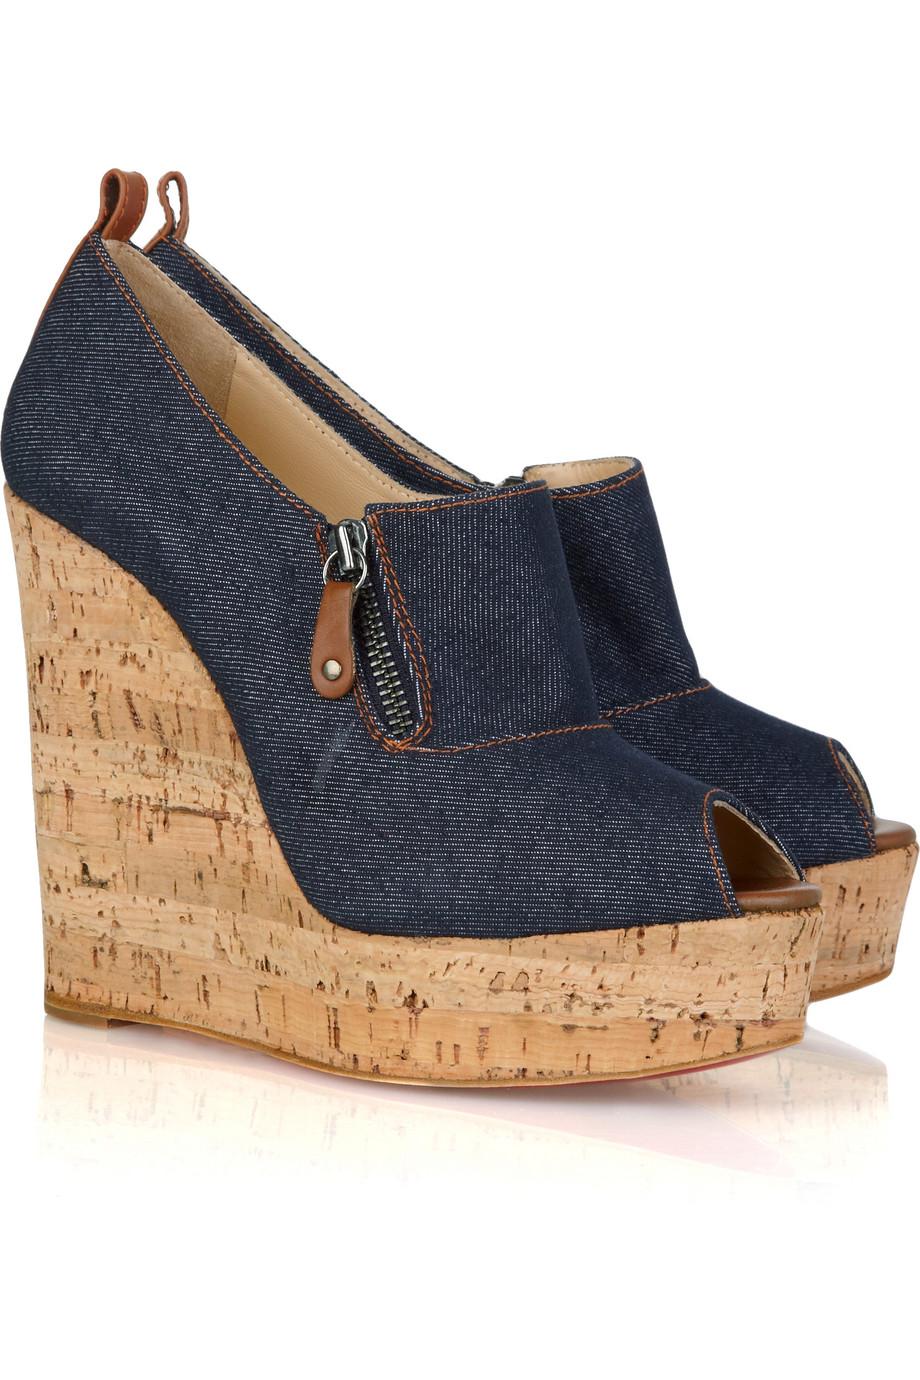 replica christian louboutins shoes - christian louboutin canvas peep-toe slingback espadrille wedges ...